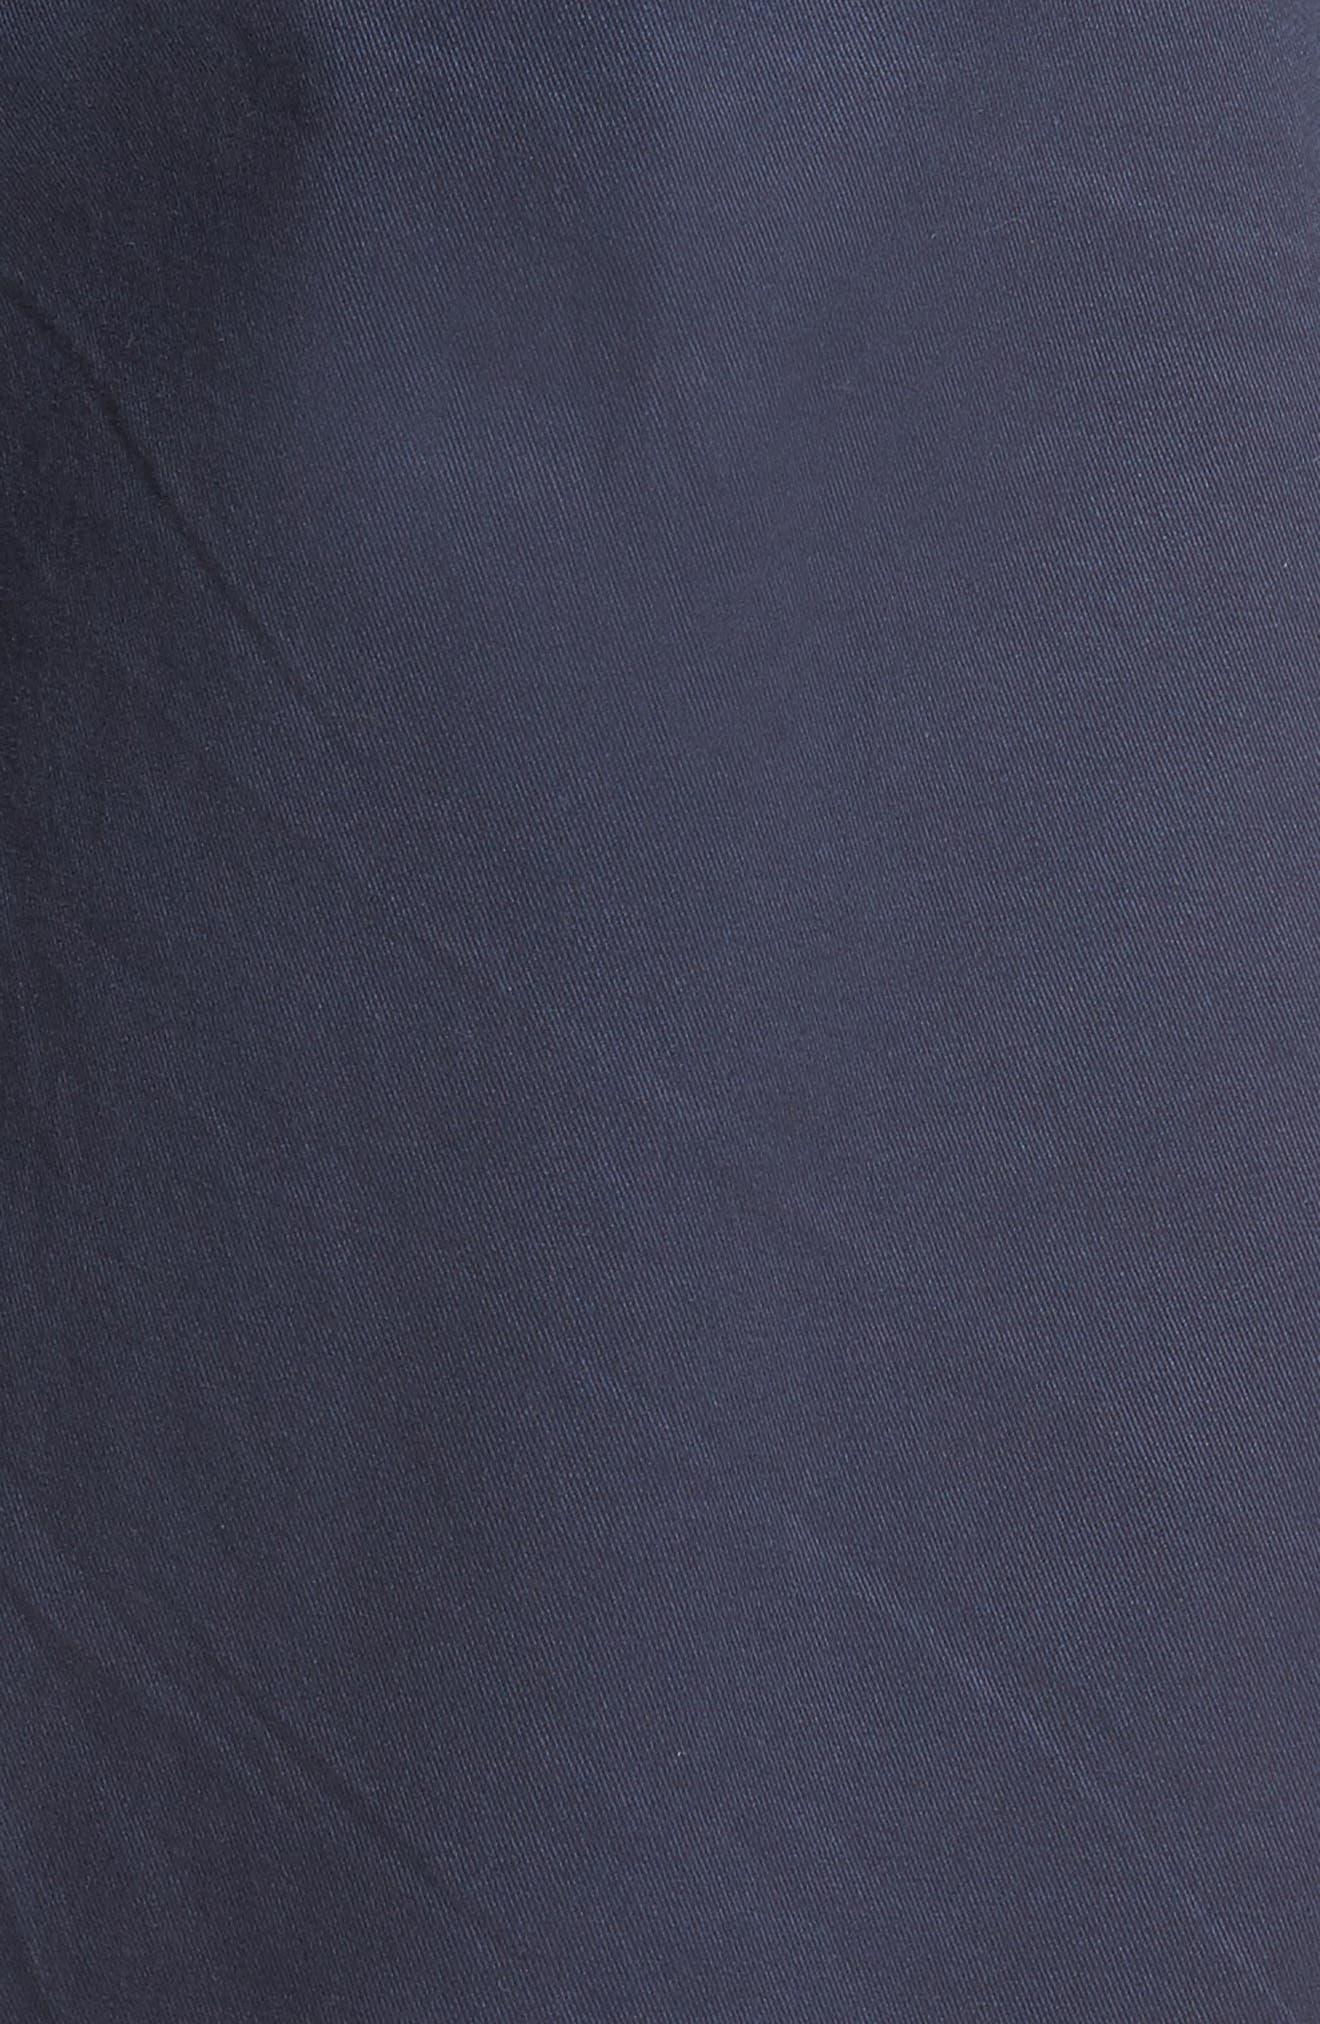 Ballard Slim Fit Stretch Chino 11-Inch Shorts,                             Alternate thumbnail 70, color,